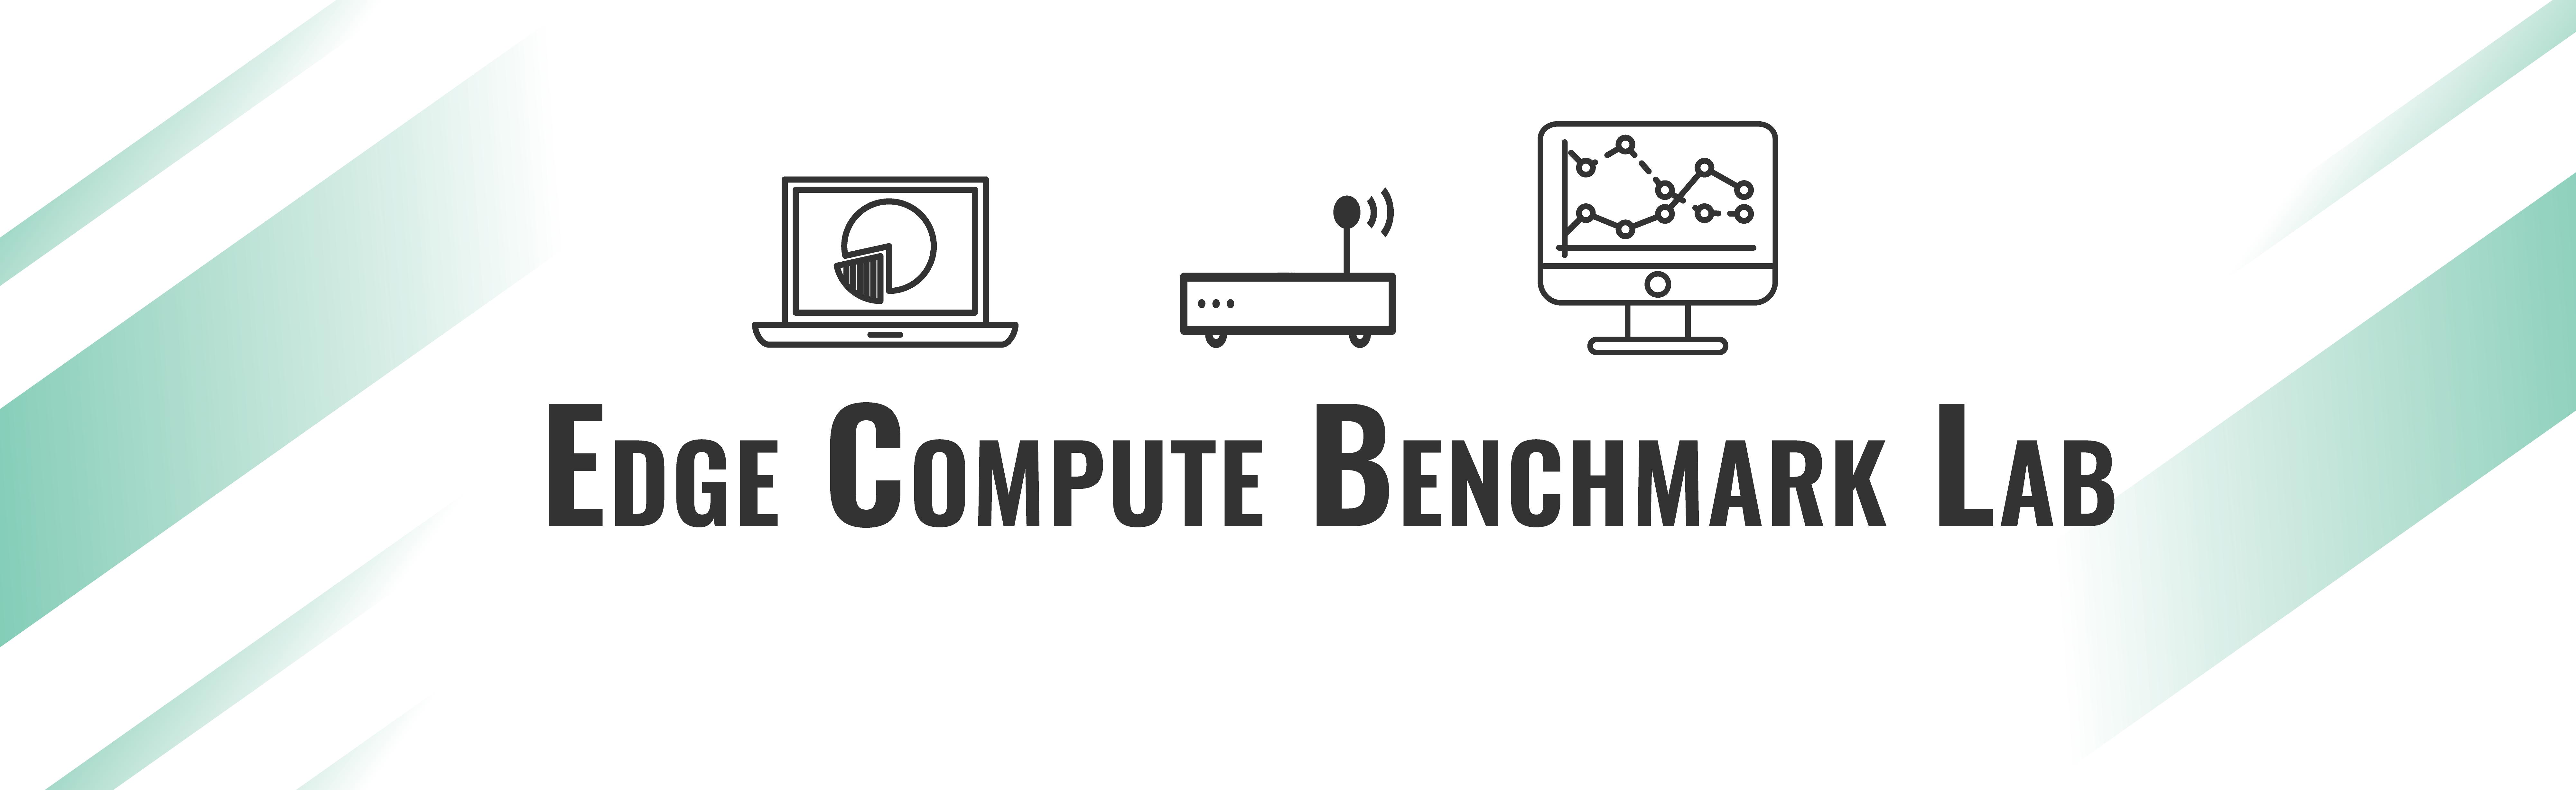 Edge Compute Benchmark